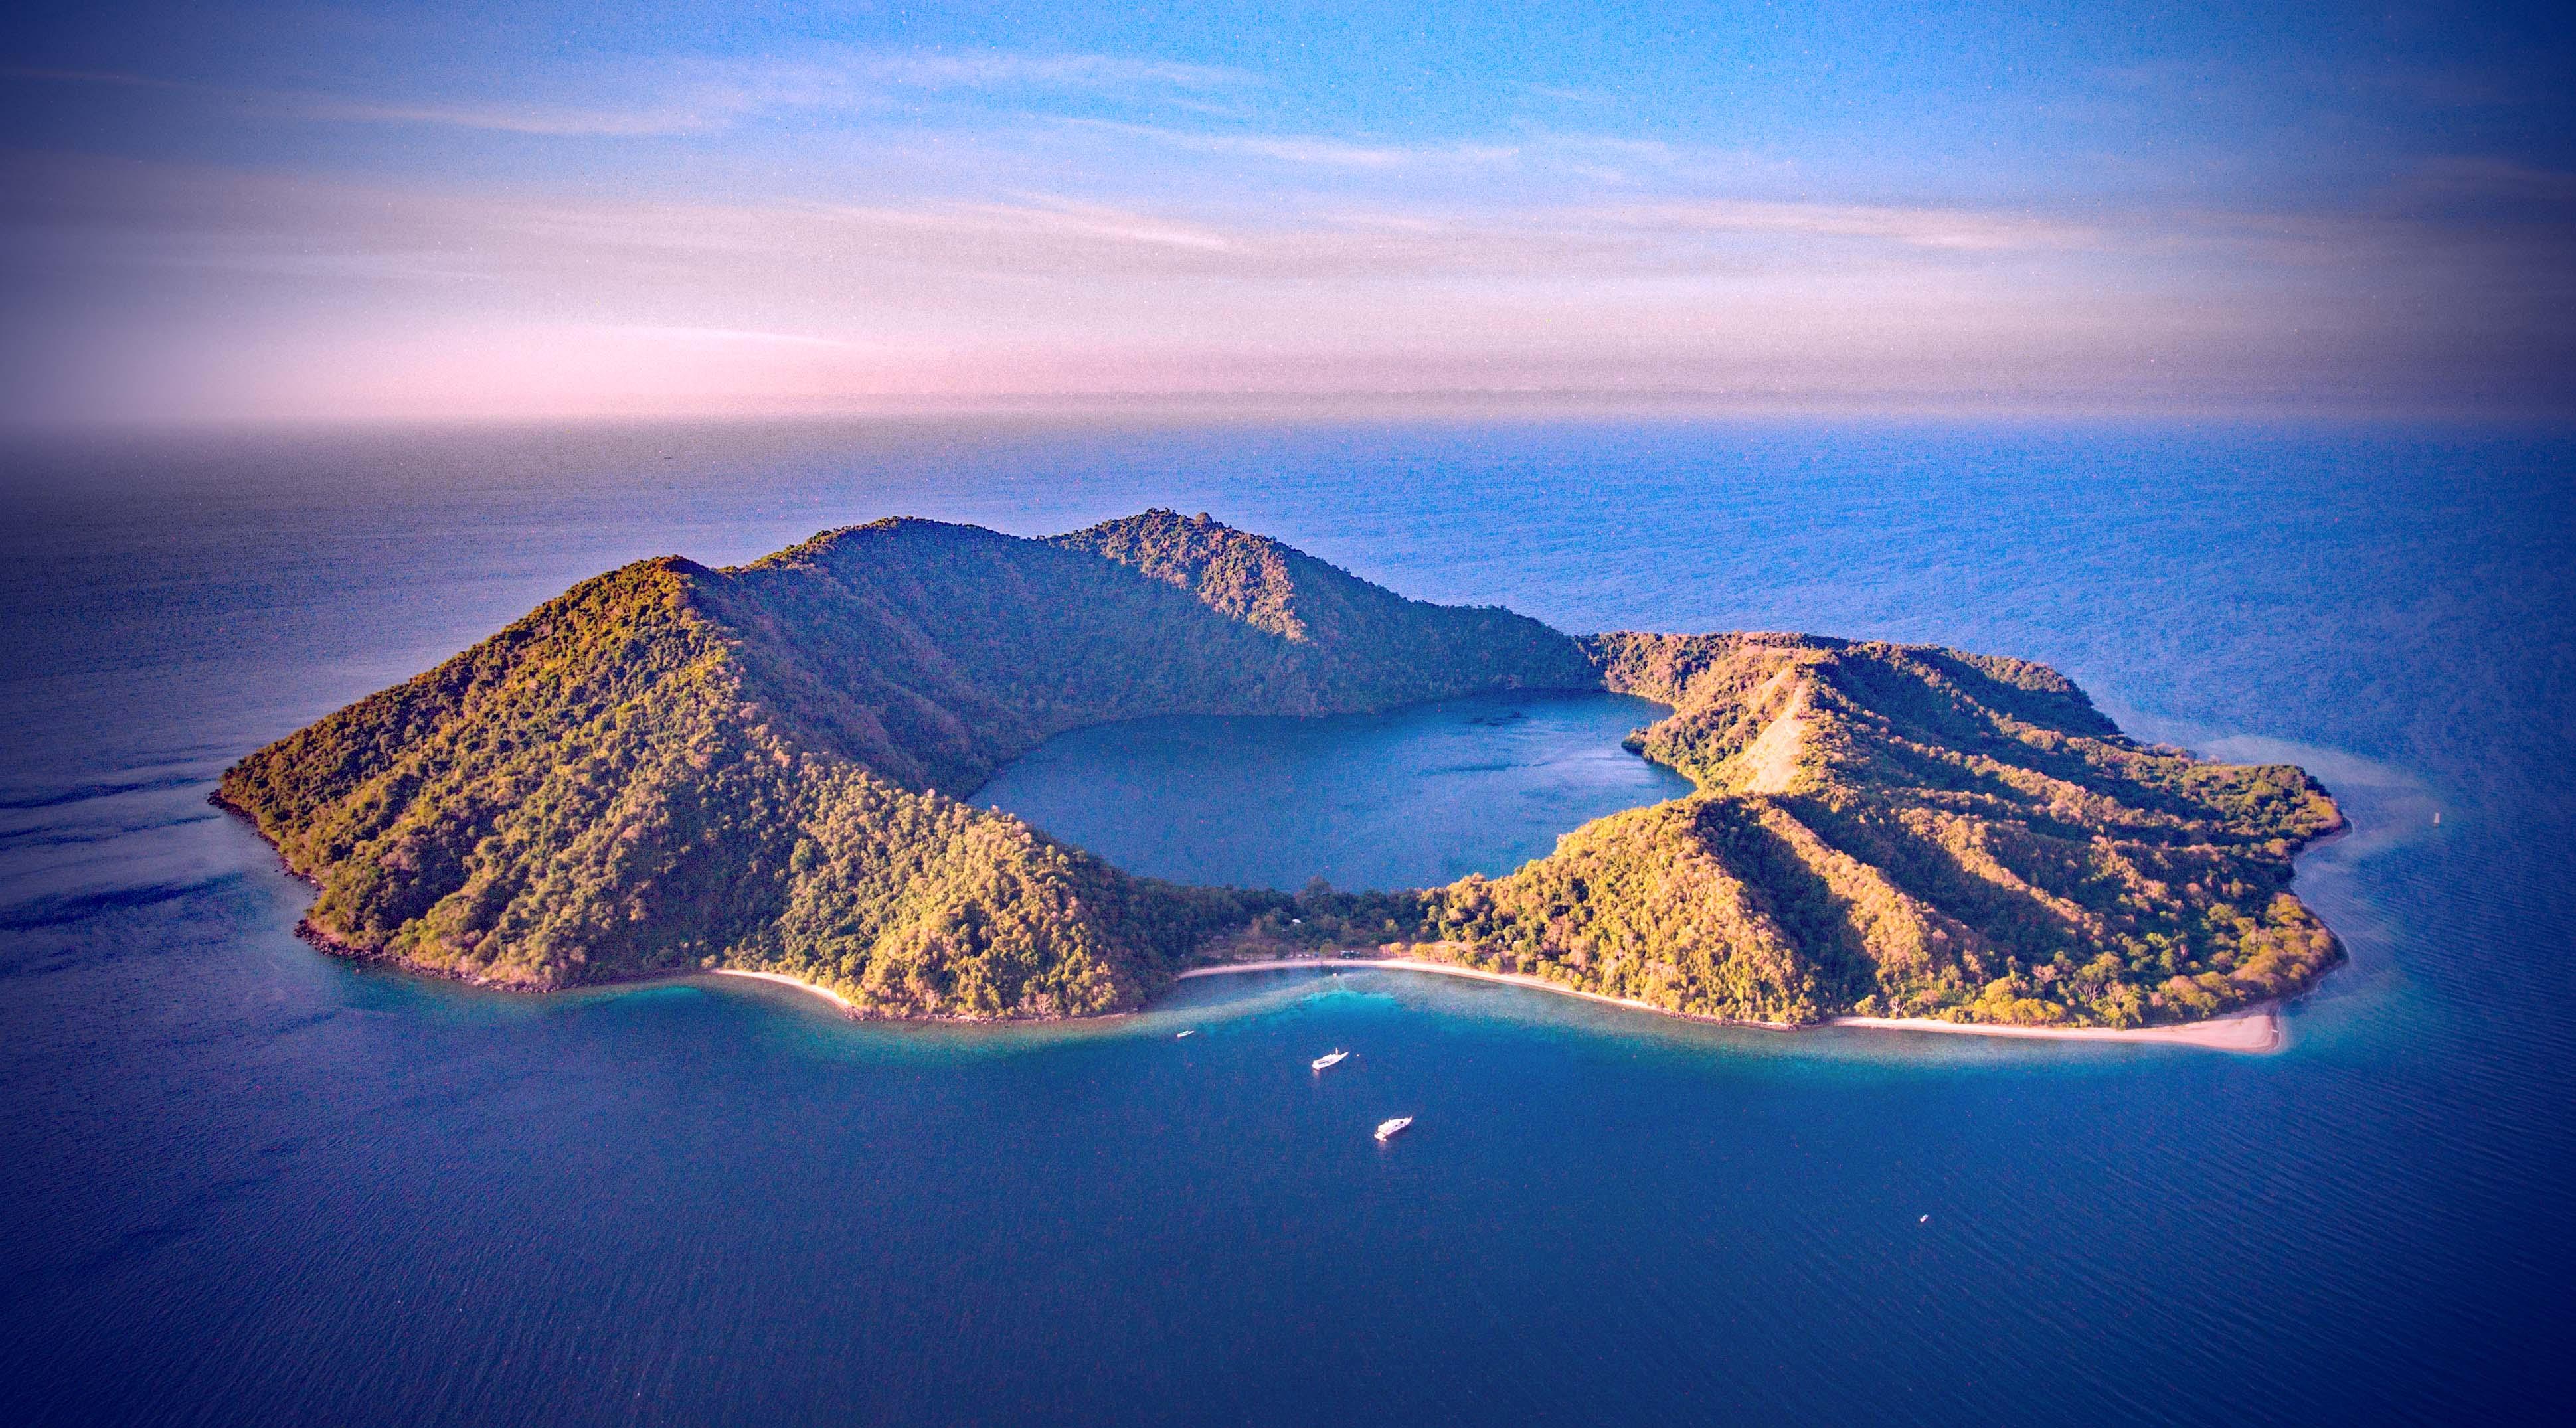 Satonda Island, an extinct Volcano in the Flores Sea.